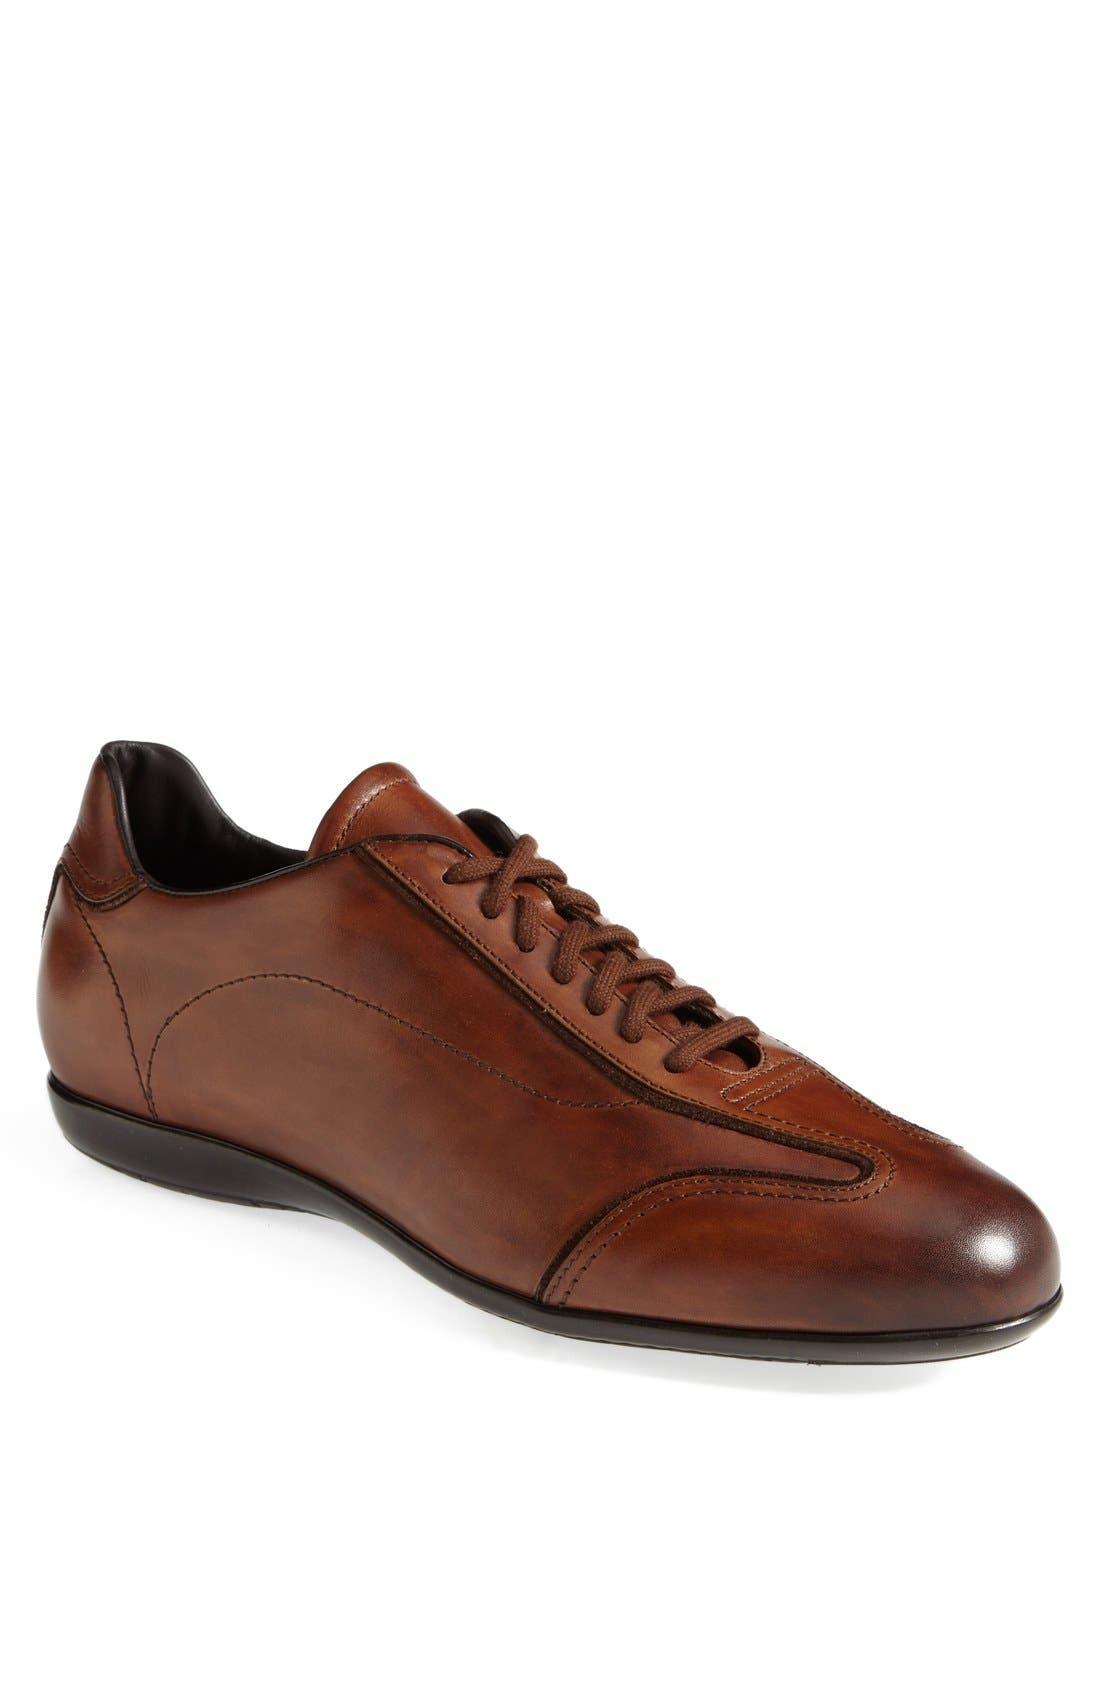 Alternate Image 1 Selected - Santoni 'Himalaya 2' Sneaker (Online Only) (Men)